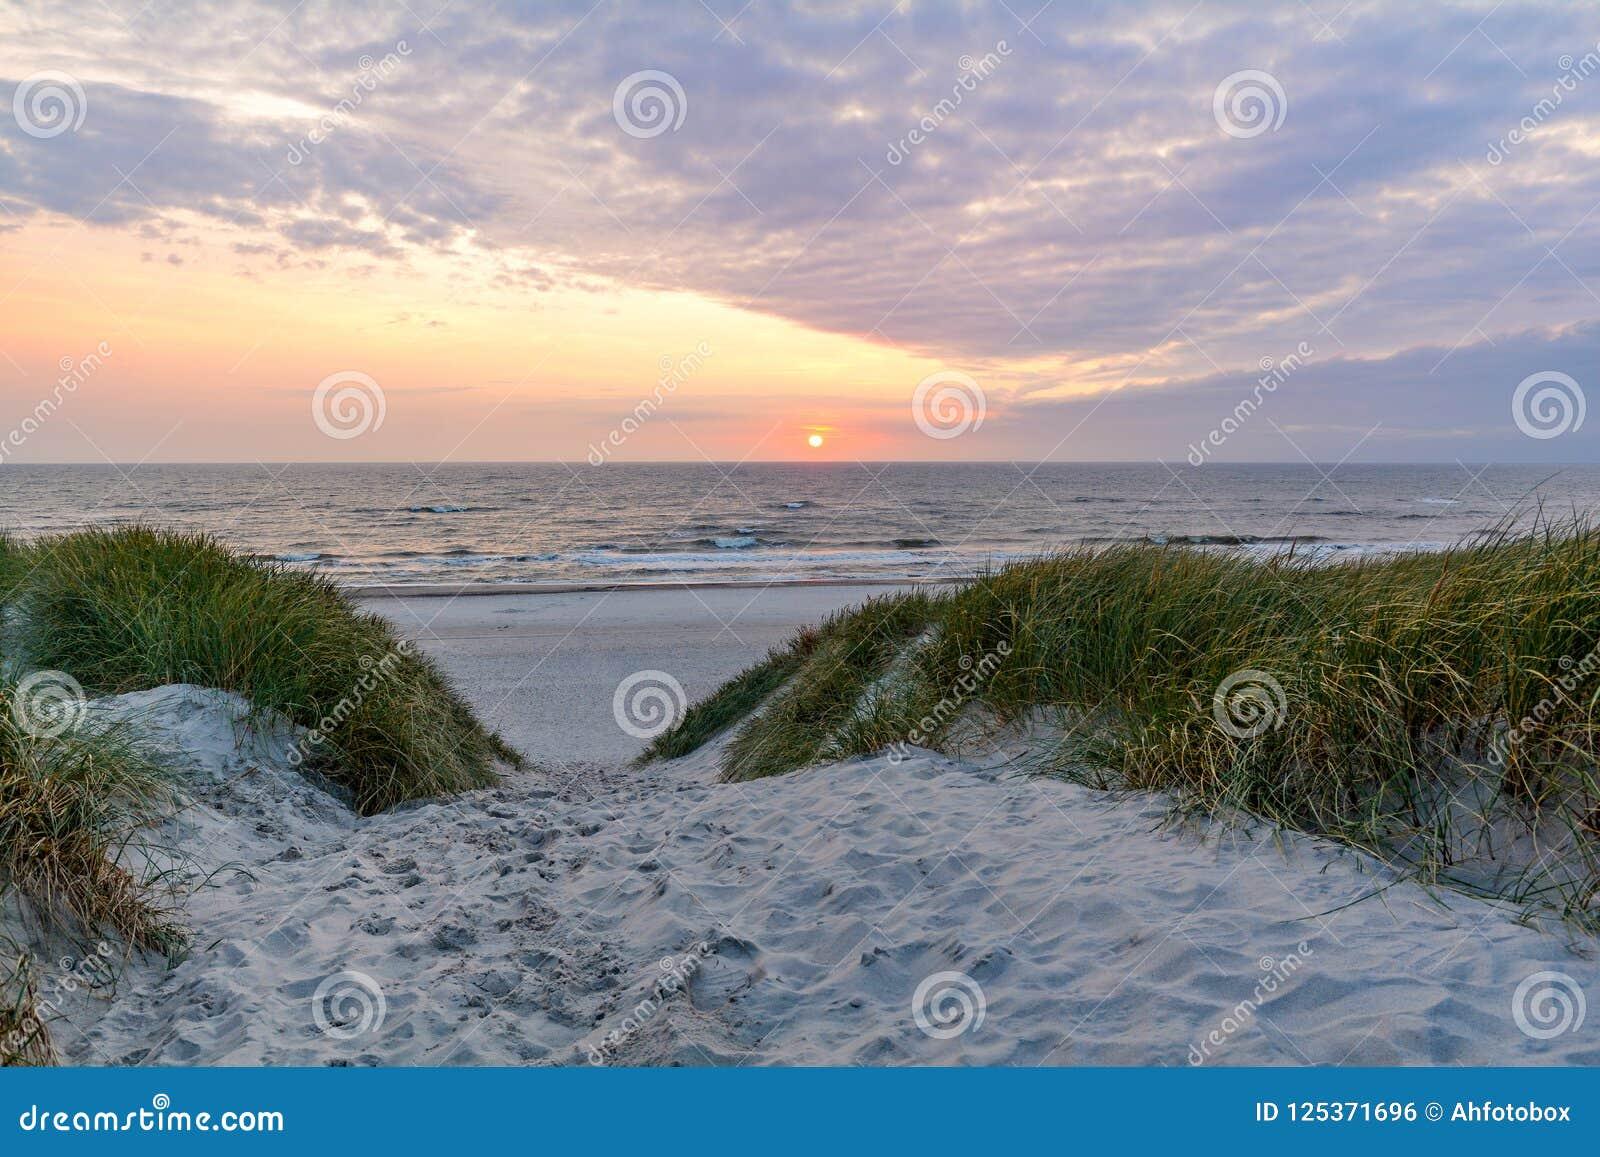 Sunset at beautiful beach with sand dune landscape near Henne Strand, Jutland Denmark